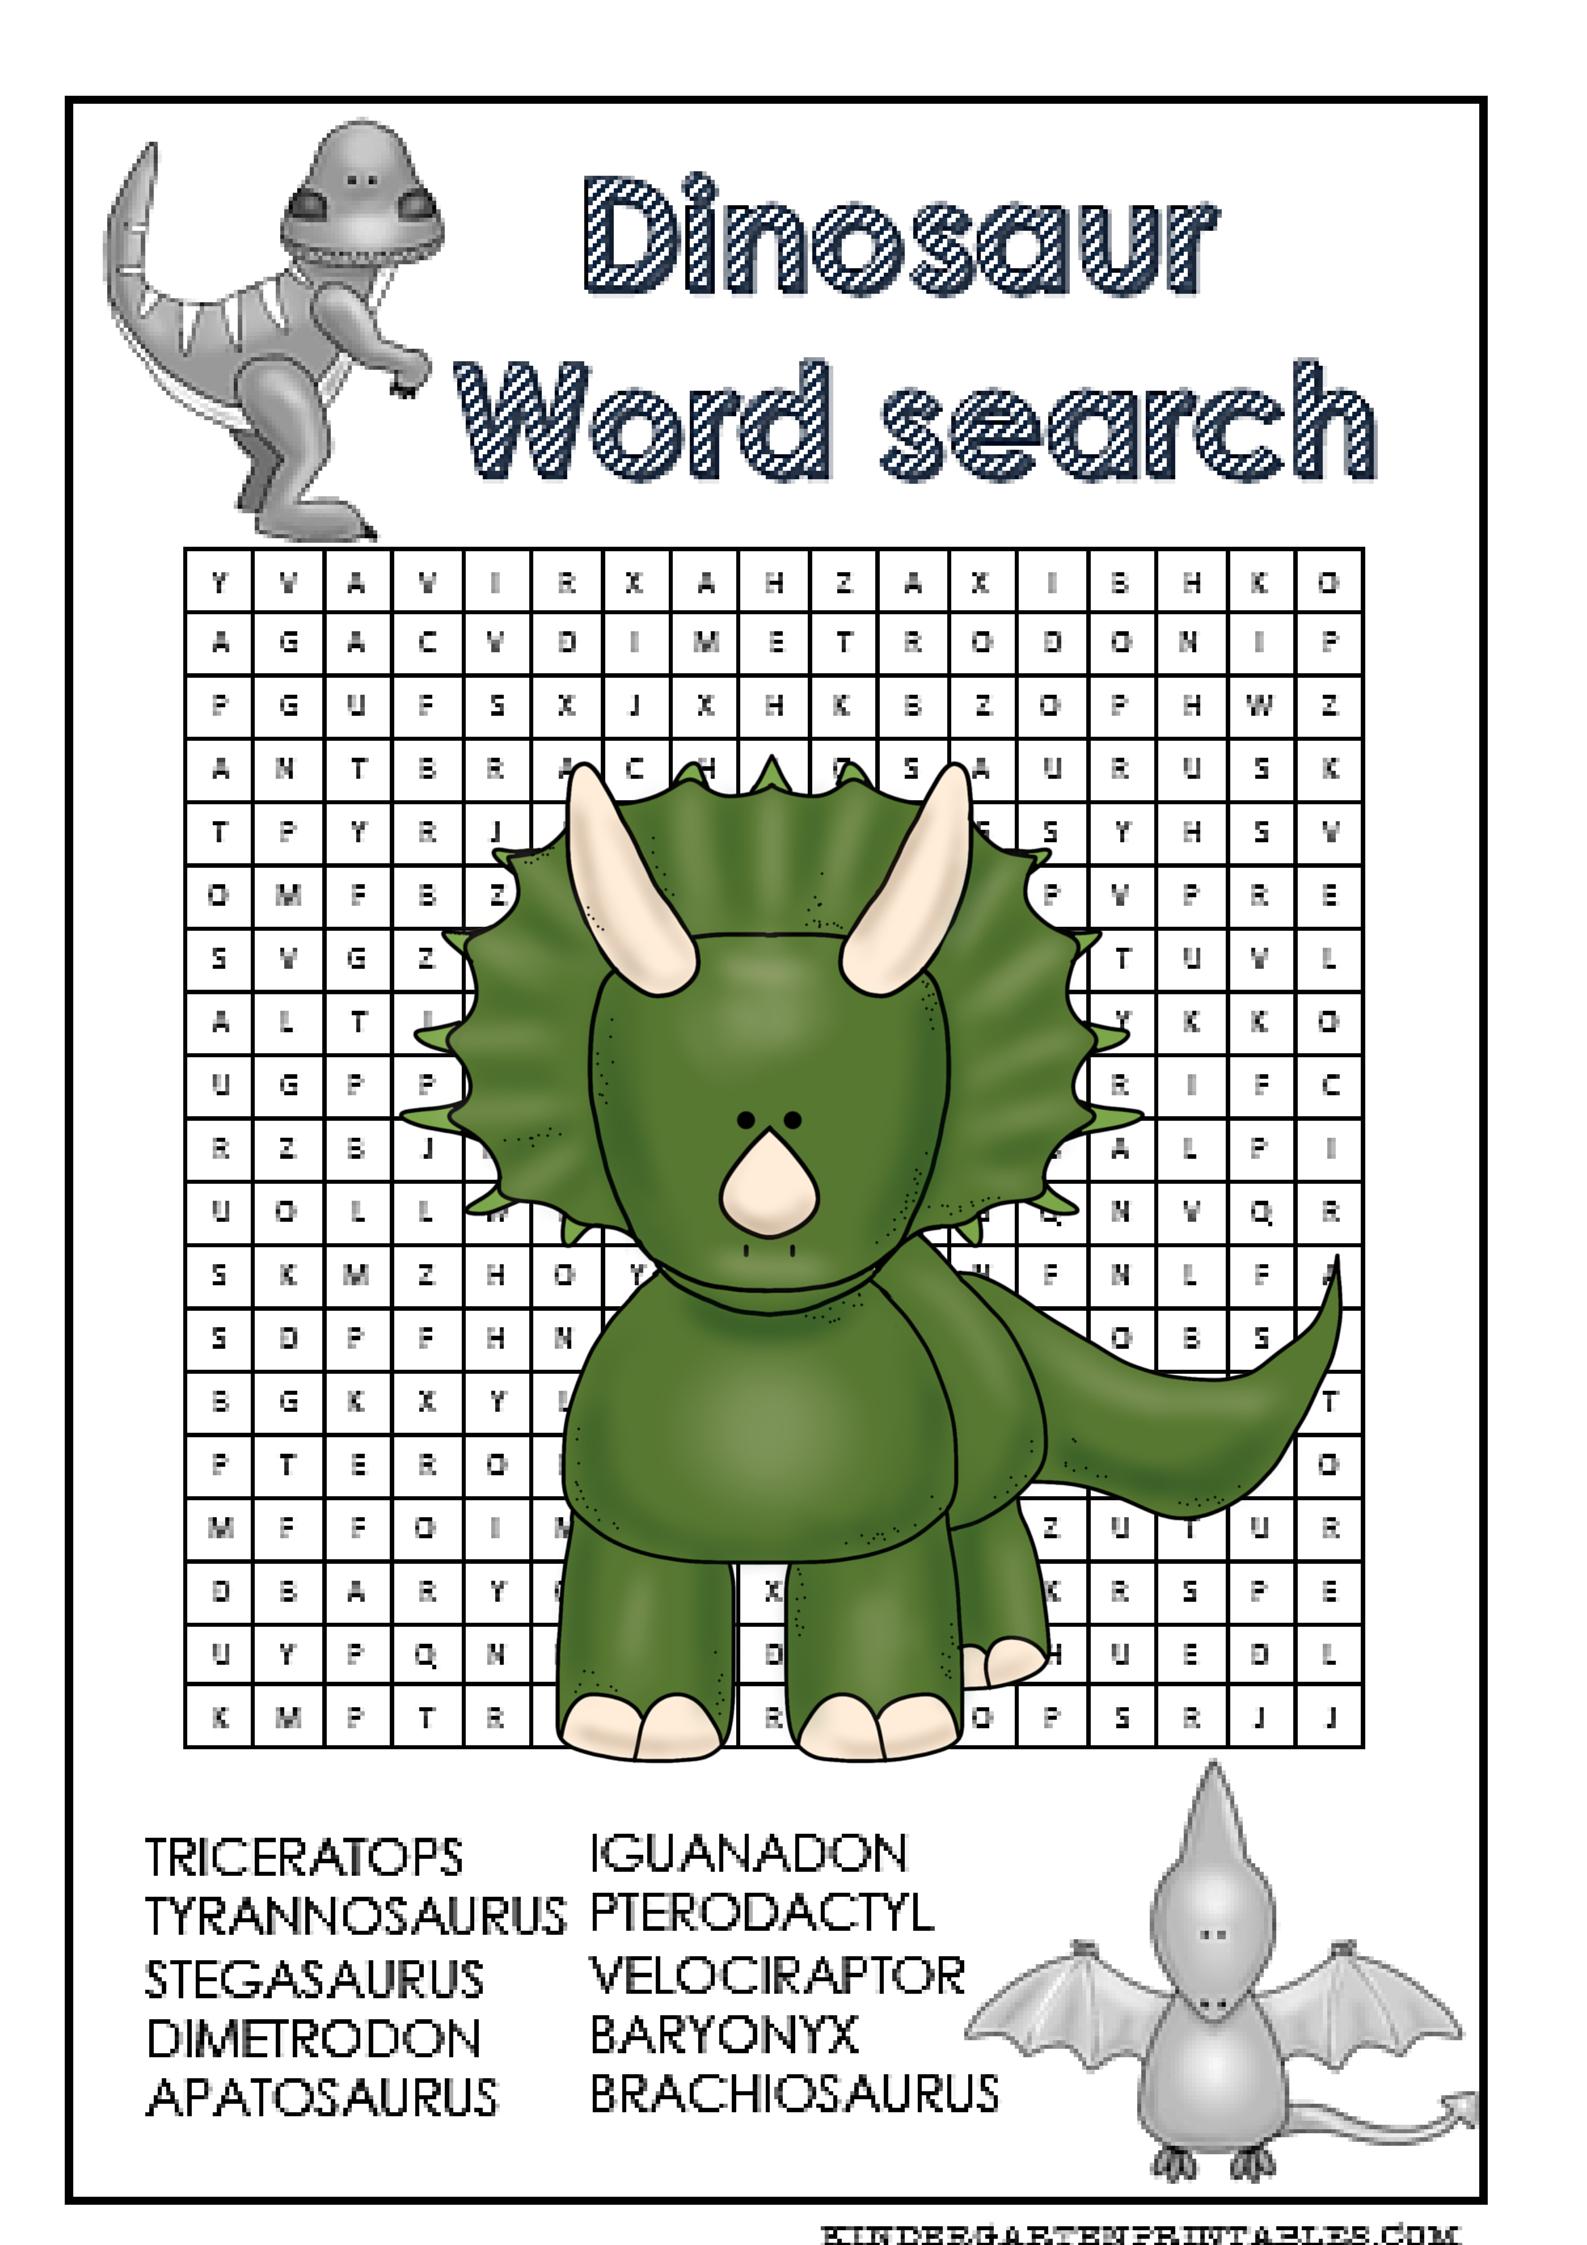 Dinosaur Word Search Free Printable   Word Search   Free Printables - Free Printable Dinosaur Word Search